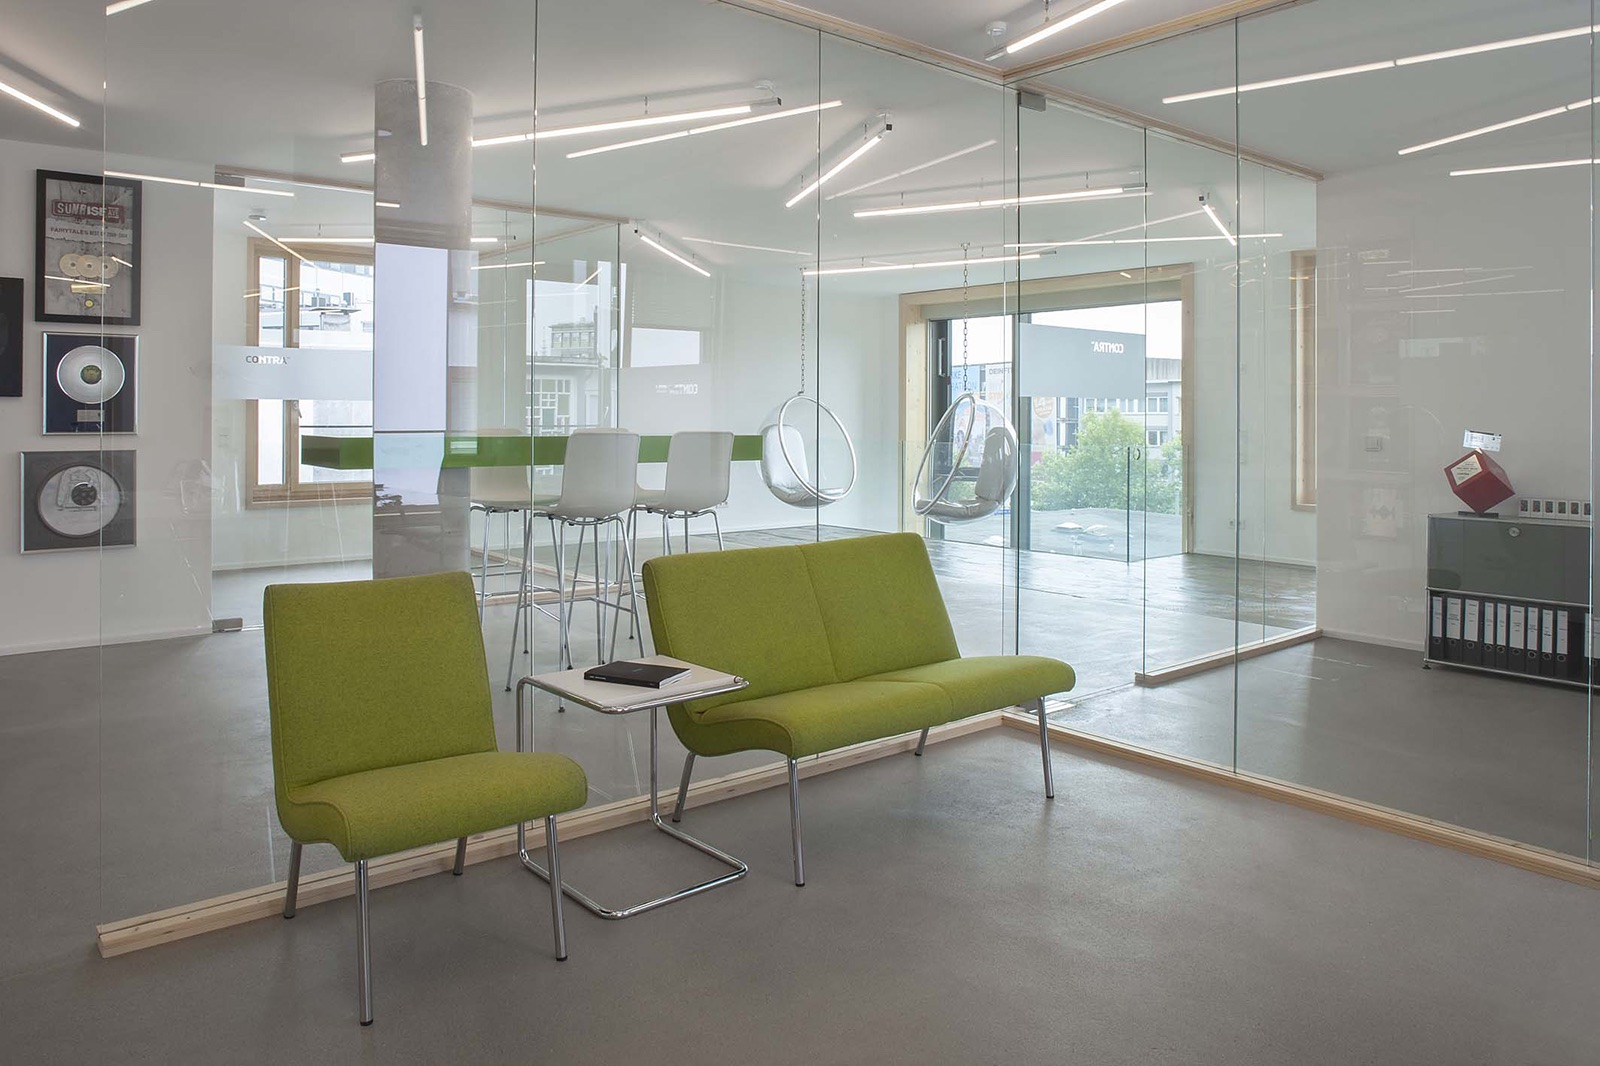 contra-bochum-office-8